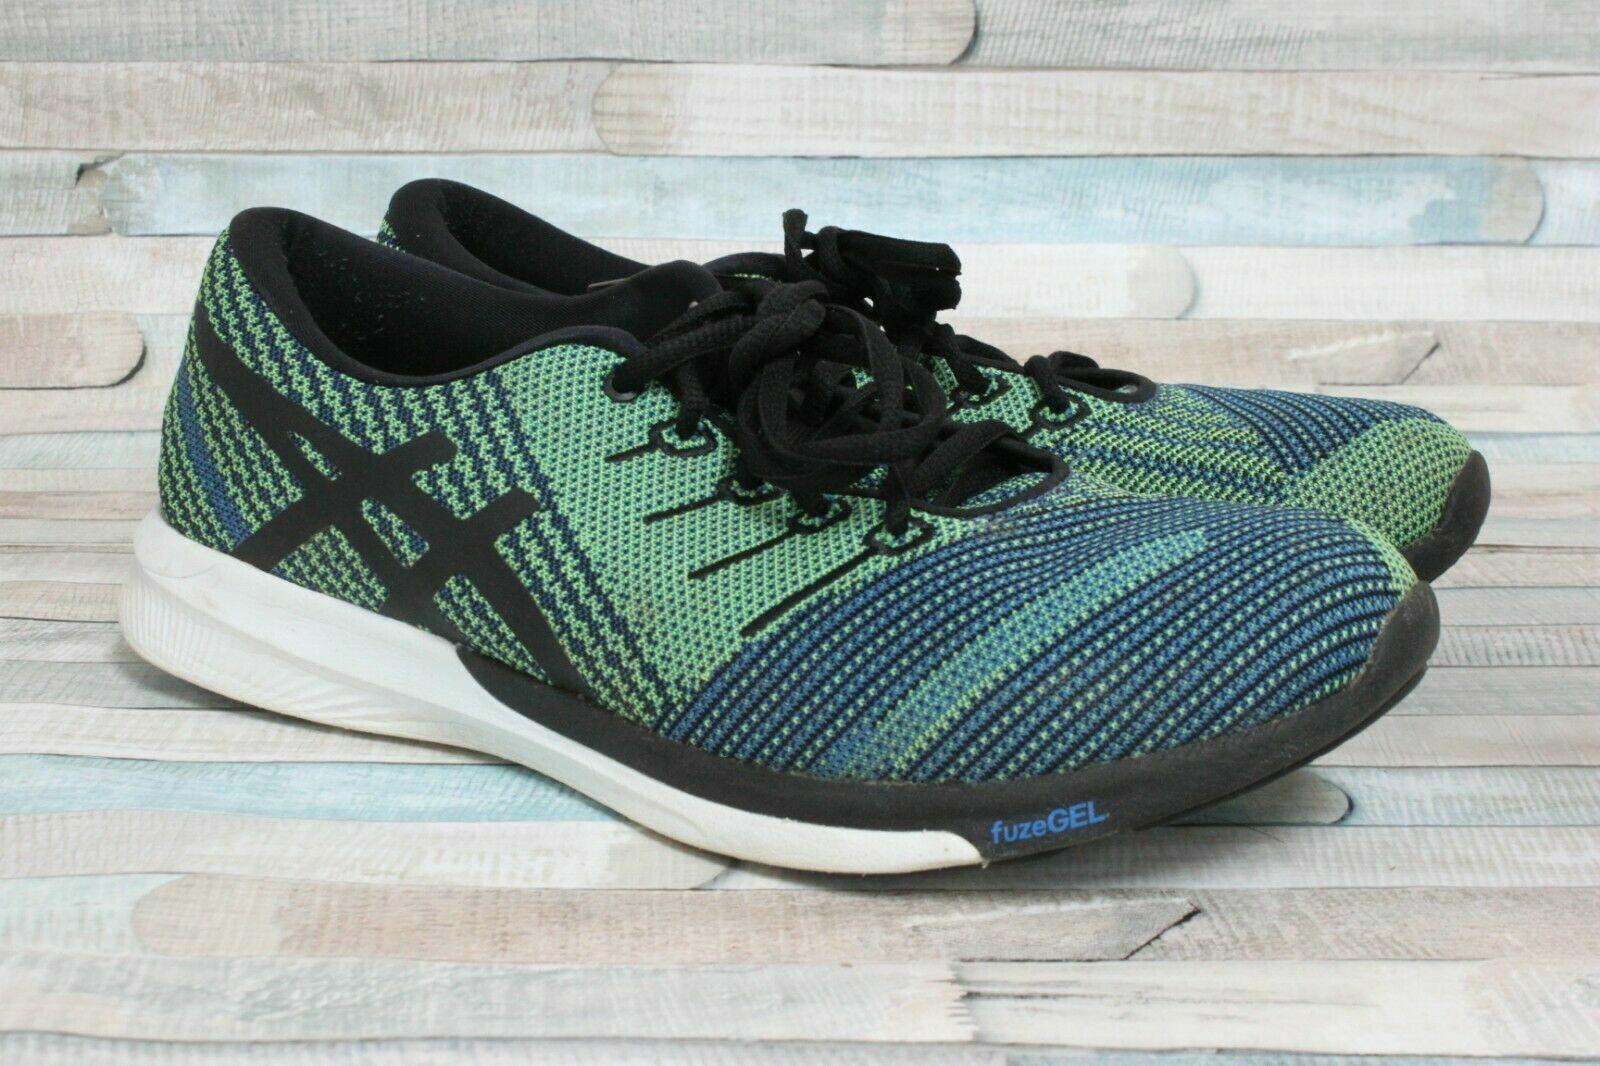 Asics T829N 4390 fuzeX Knit bluee Black Men's Running shoes Size 8.5 US